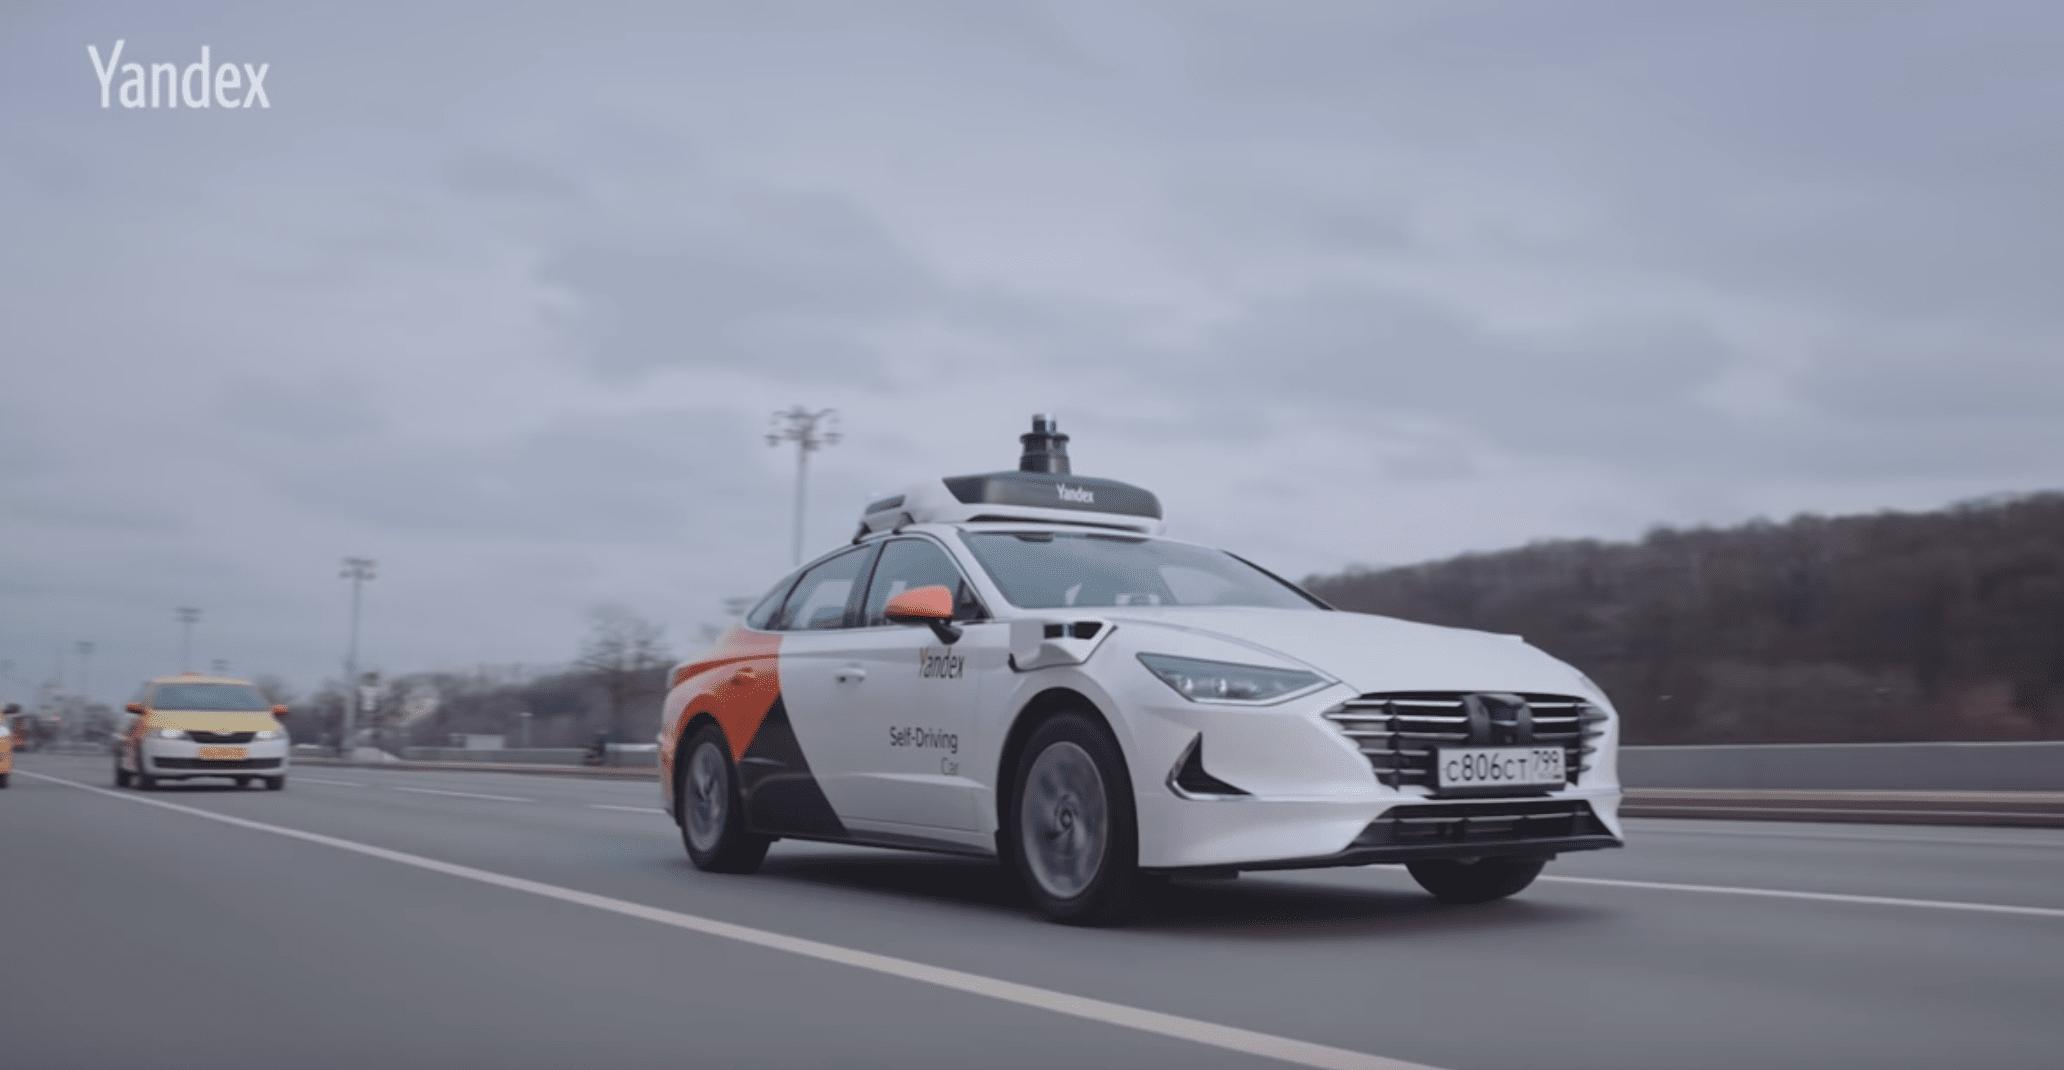 hyundai, sonata, car, self-driving